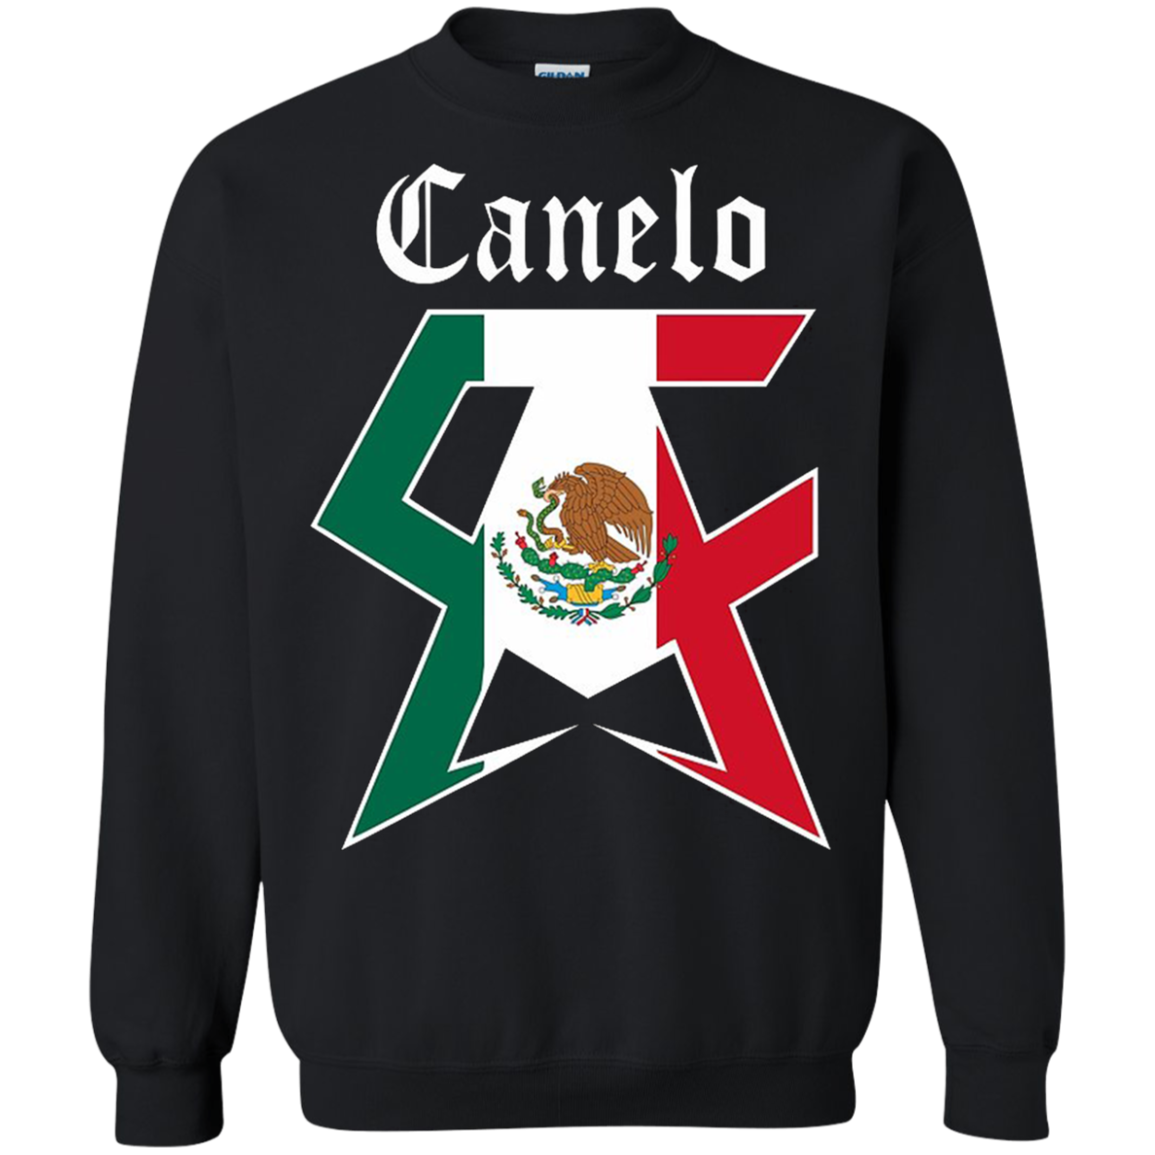 Canelo Alvarez Sweater Sweaters Cool Shirts Shirts